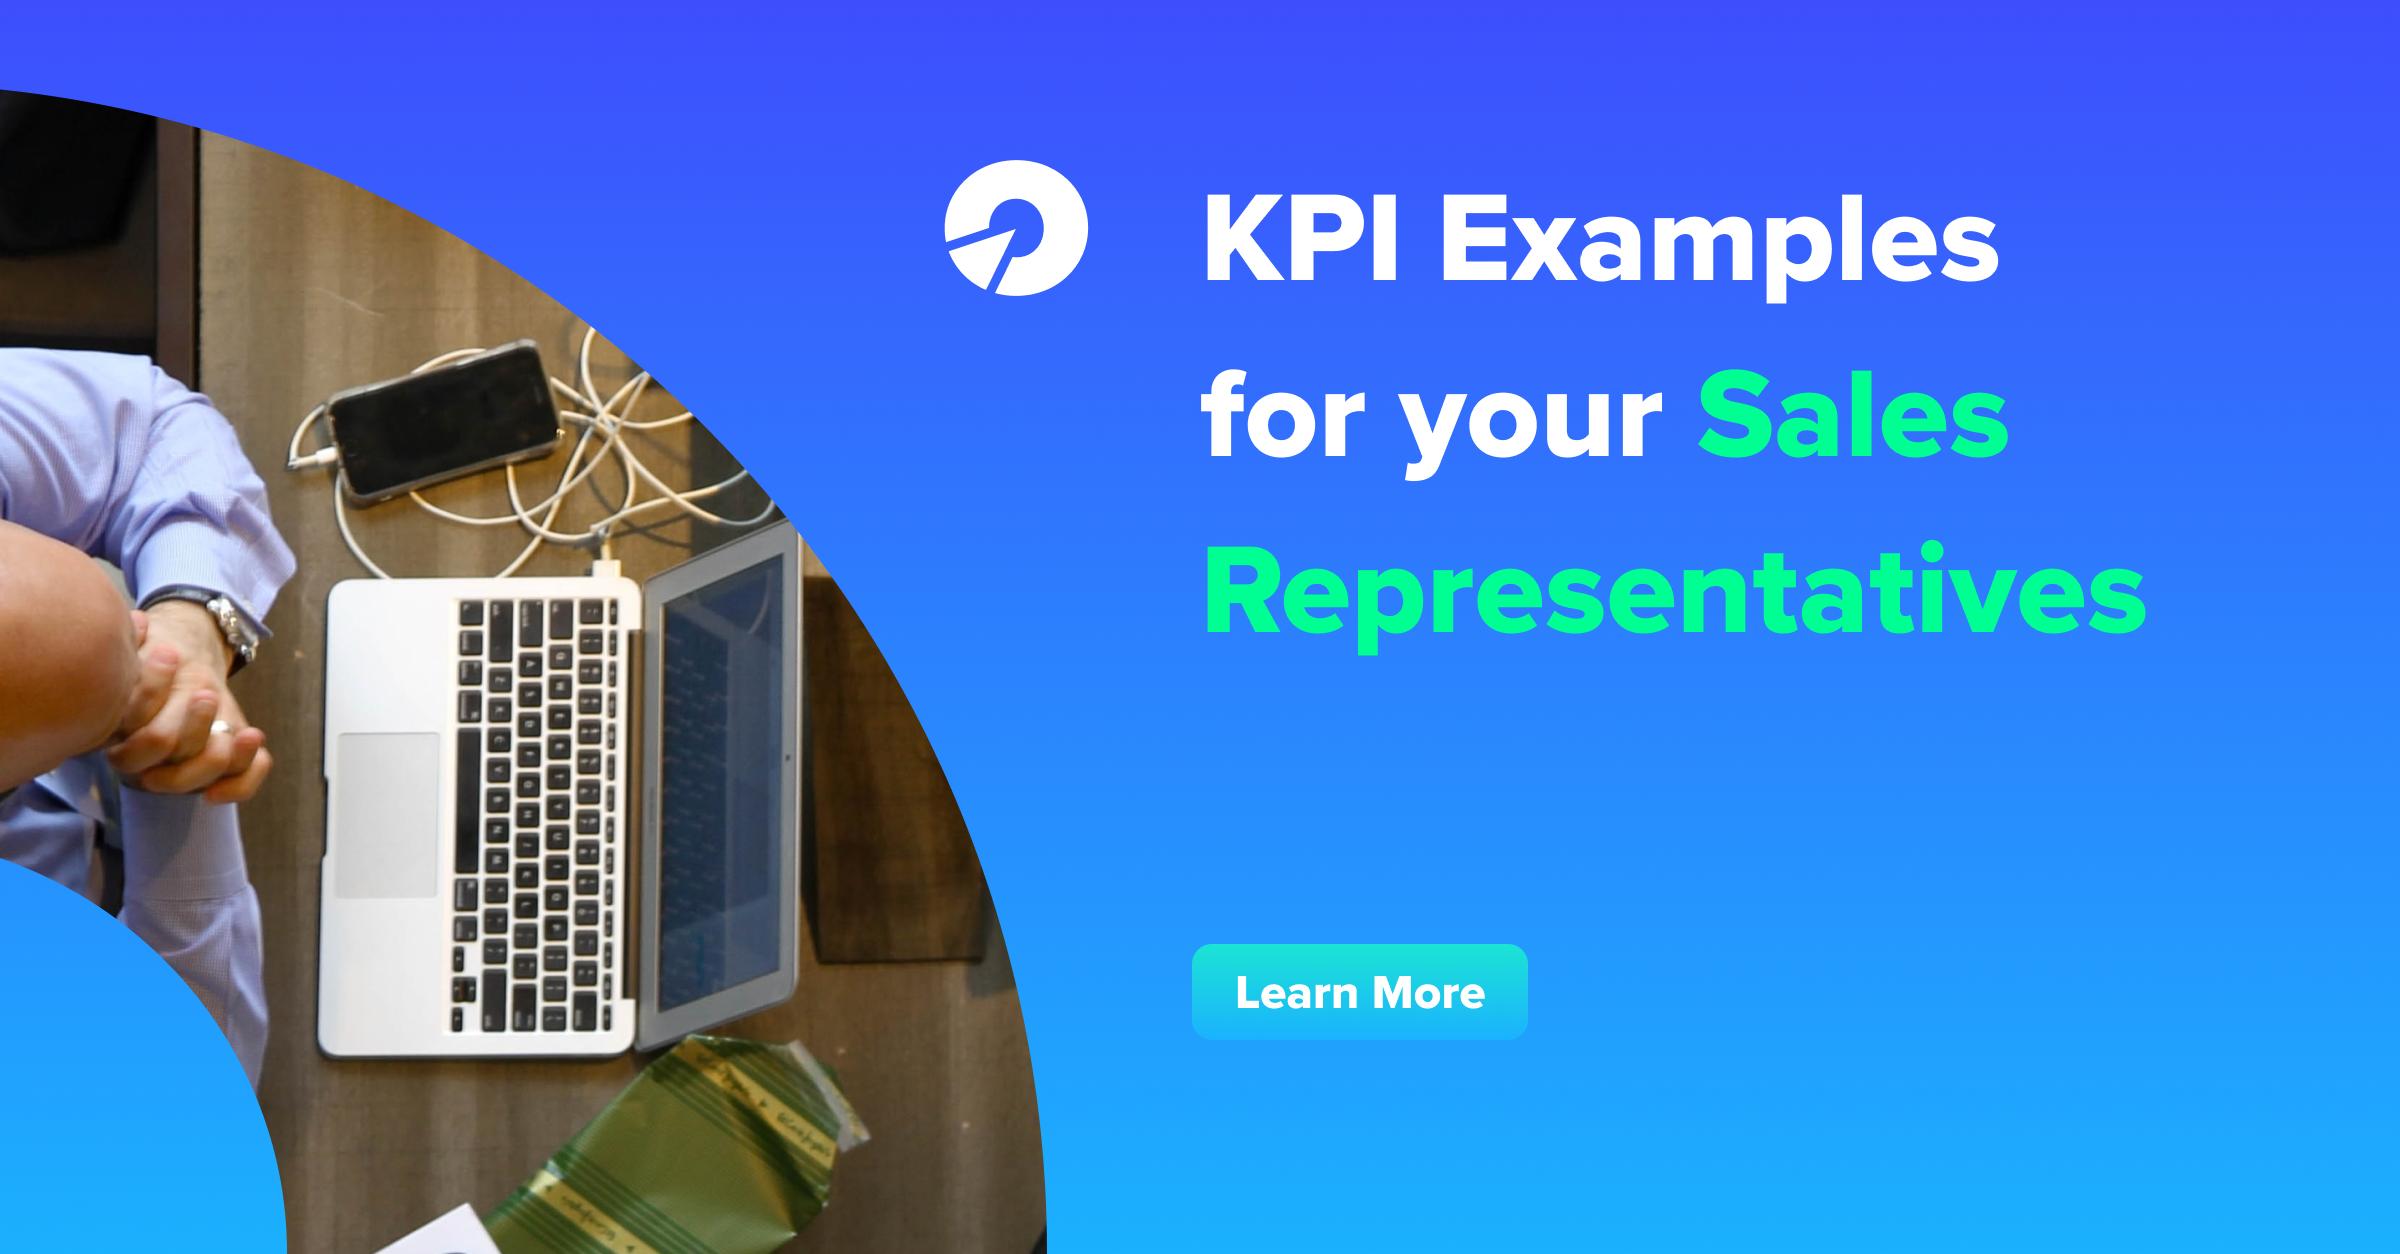 kpi examples for sales representative